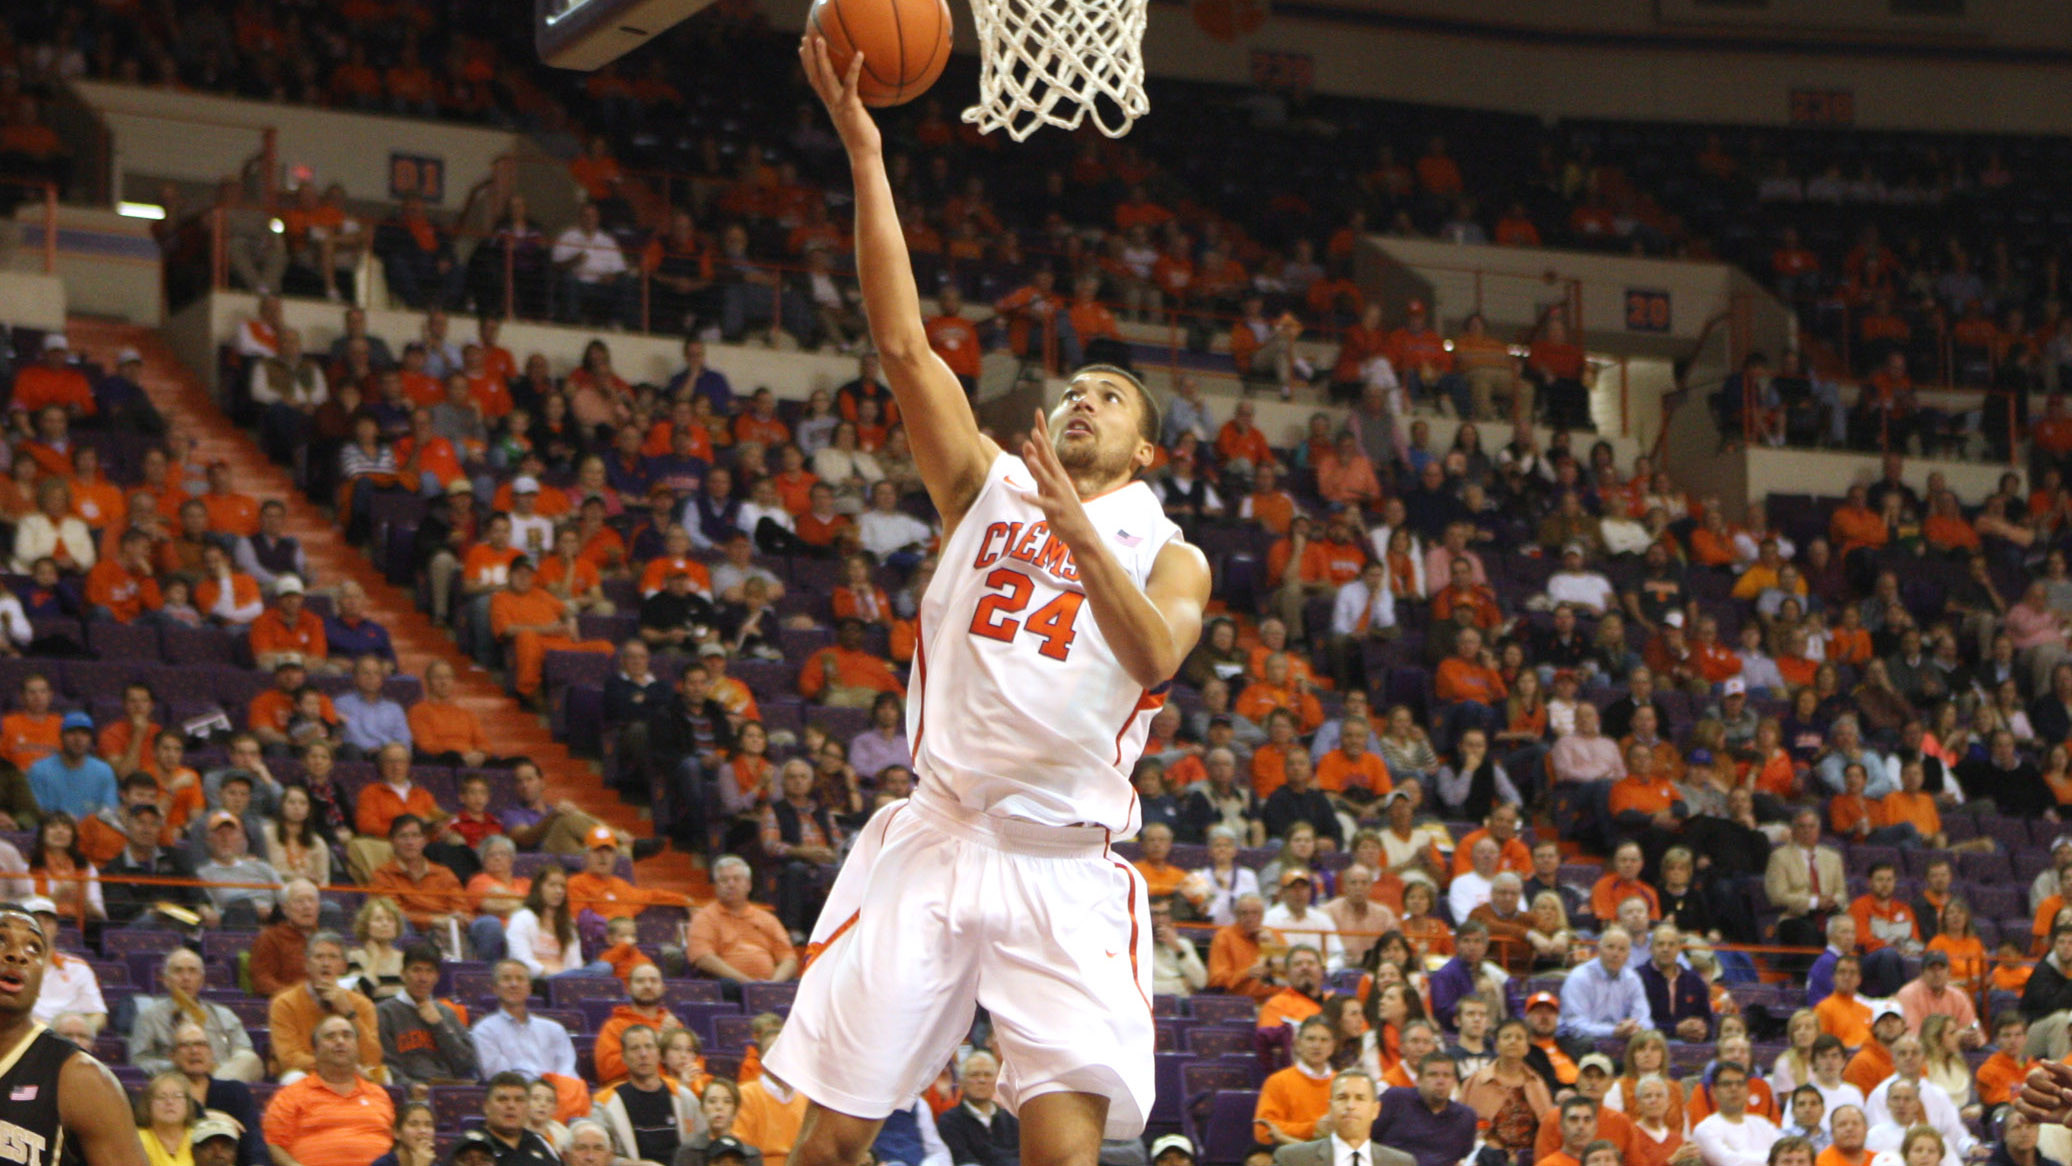 Tigers to Play Host to North Carolina Thursday